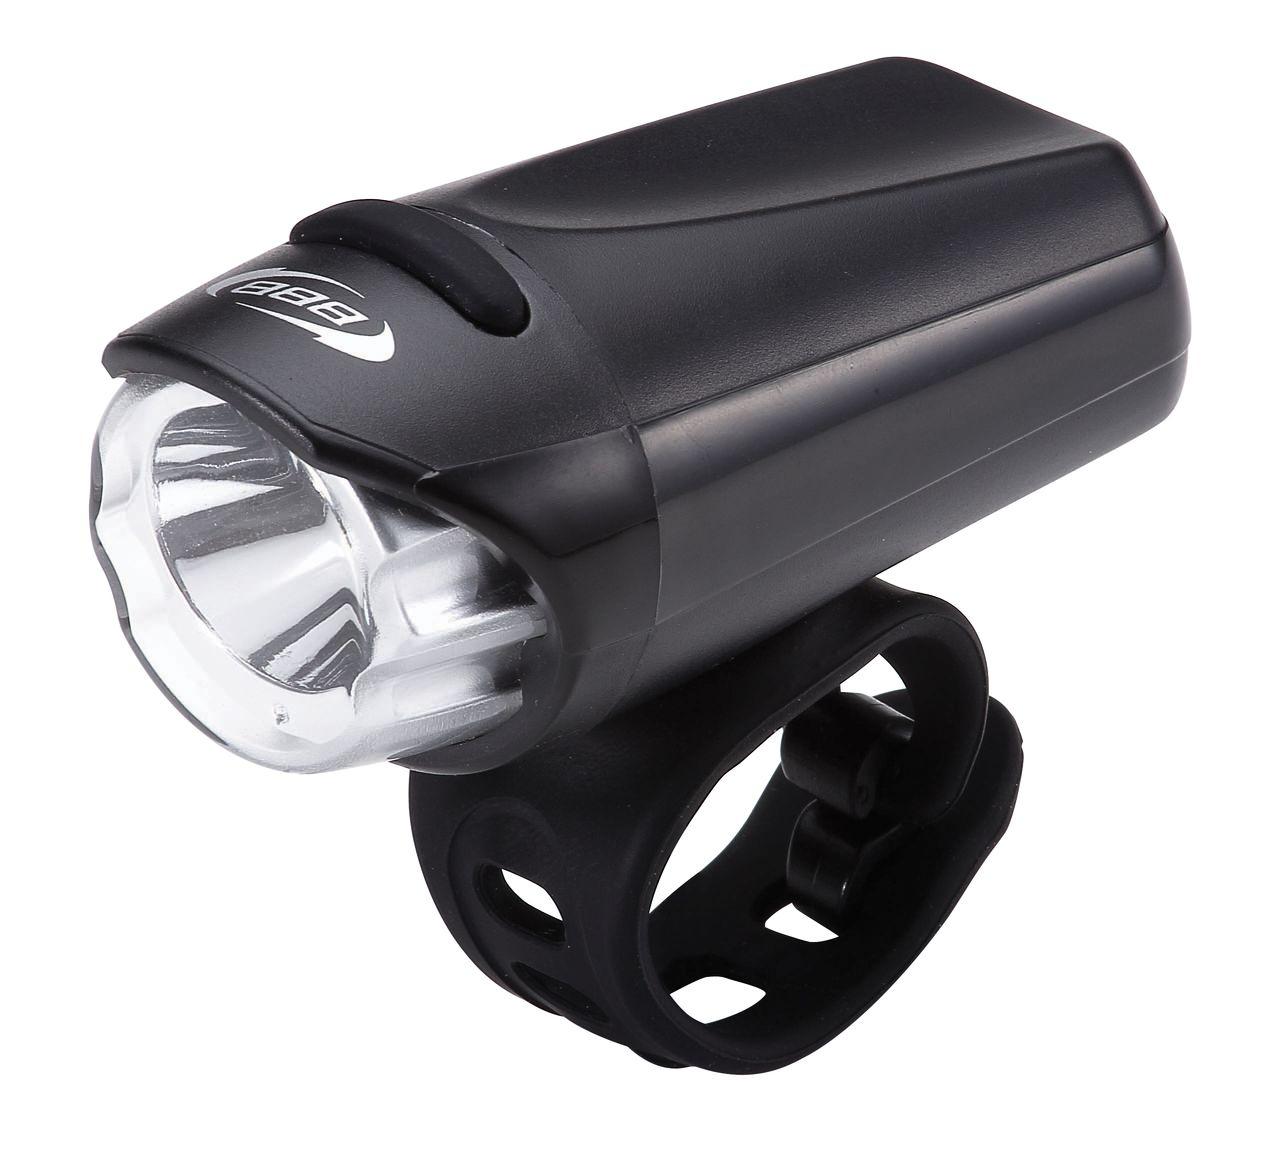 Éclairage AV BBB EcoBeam LED à piles Noir - BLS-75